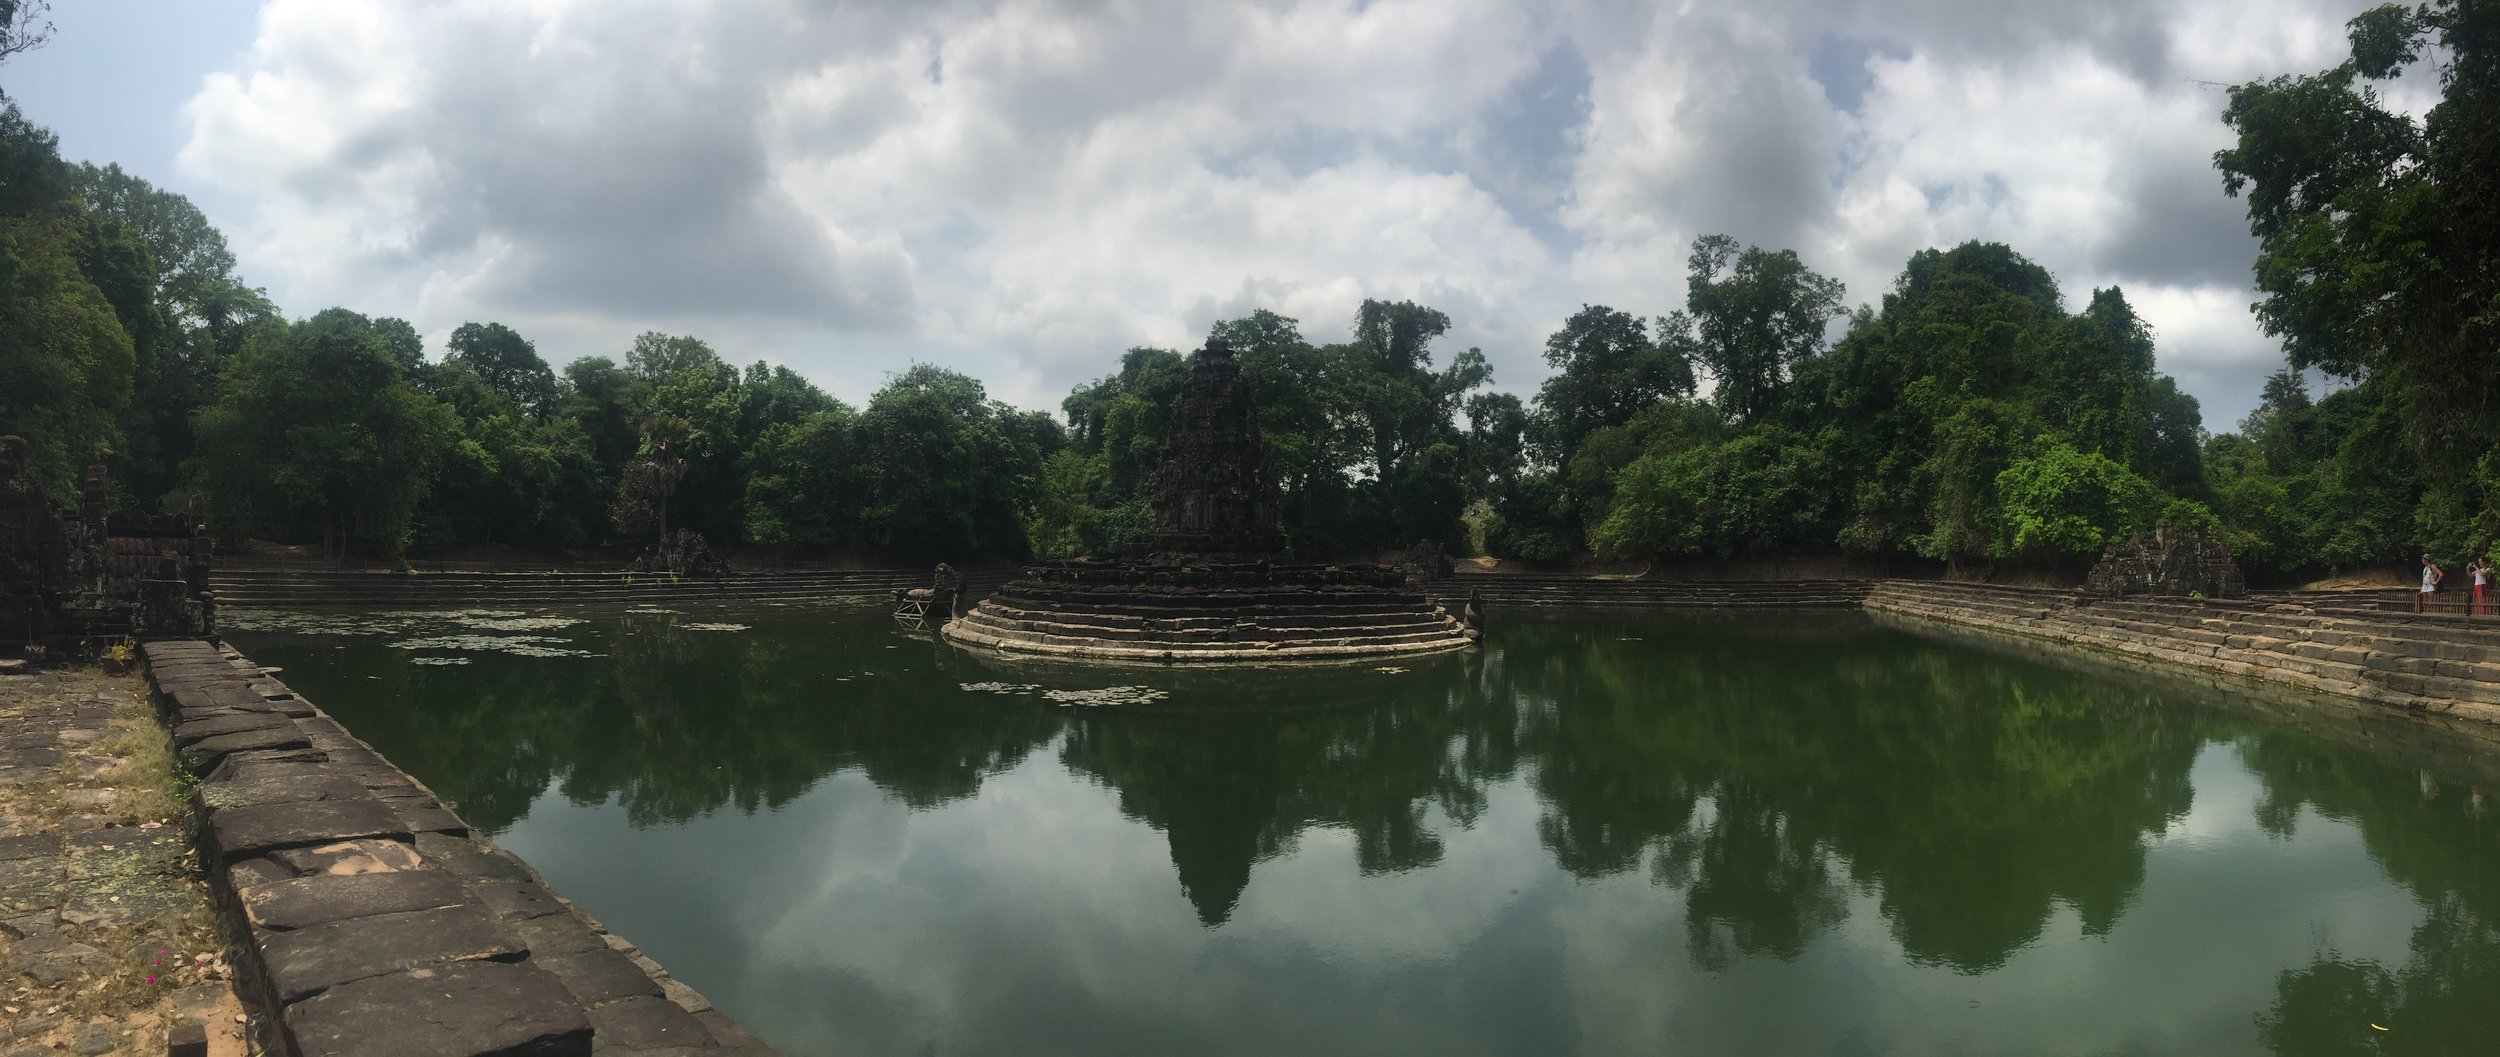 Neak Pean - 12th Century AD Buddhist temple built a top an artificial island.